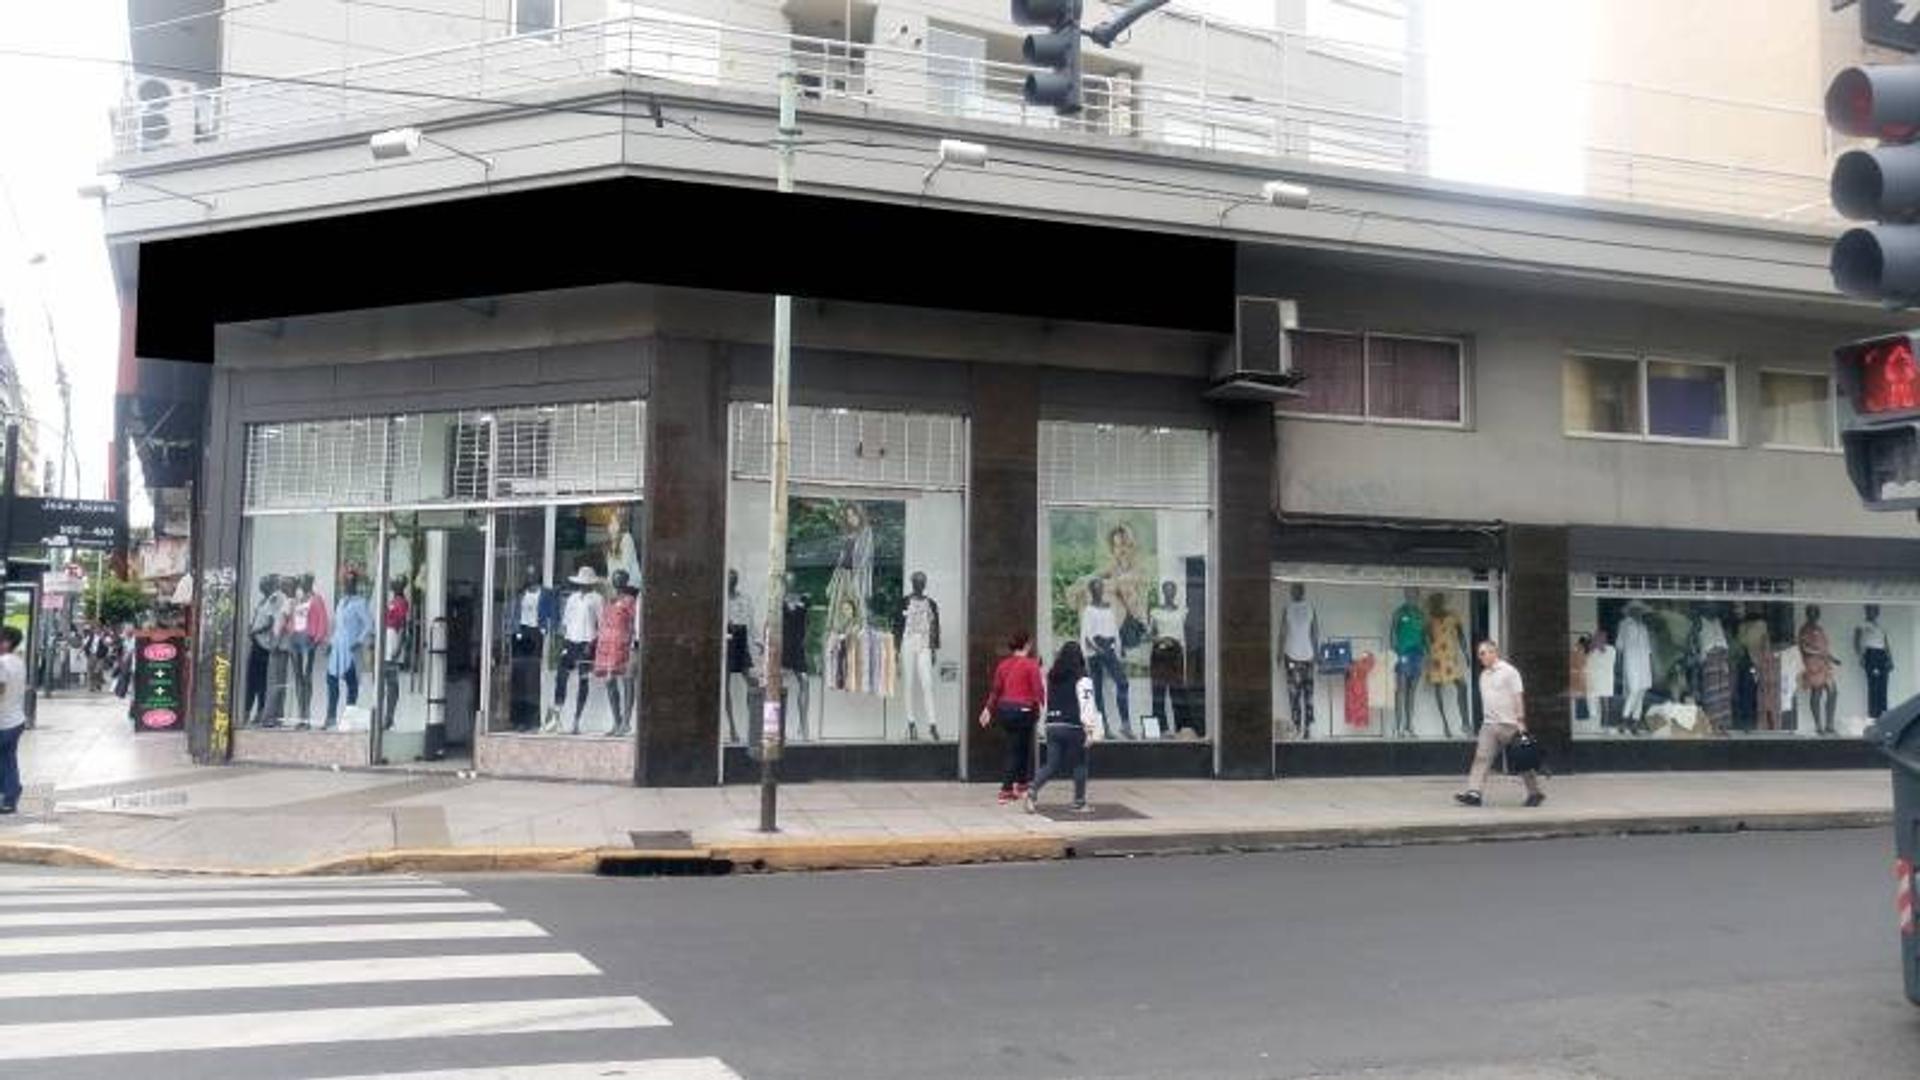 Av. Corrientes 3000 - Abasto - Capital Federal